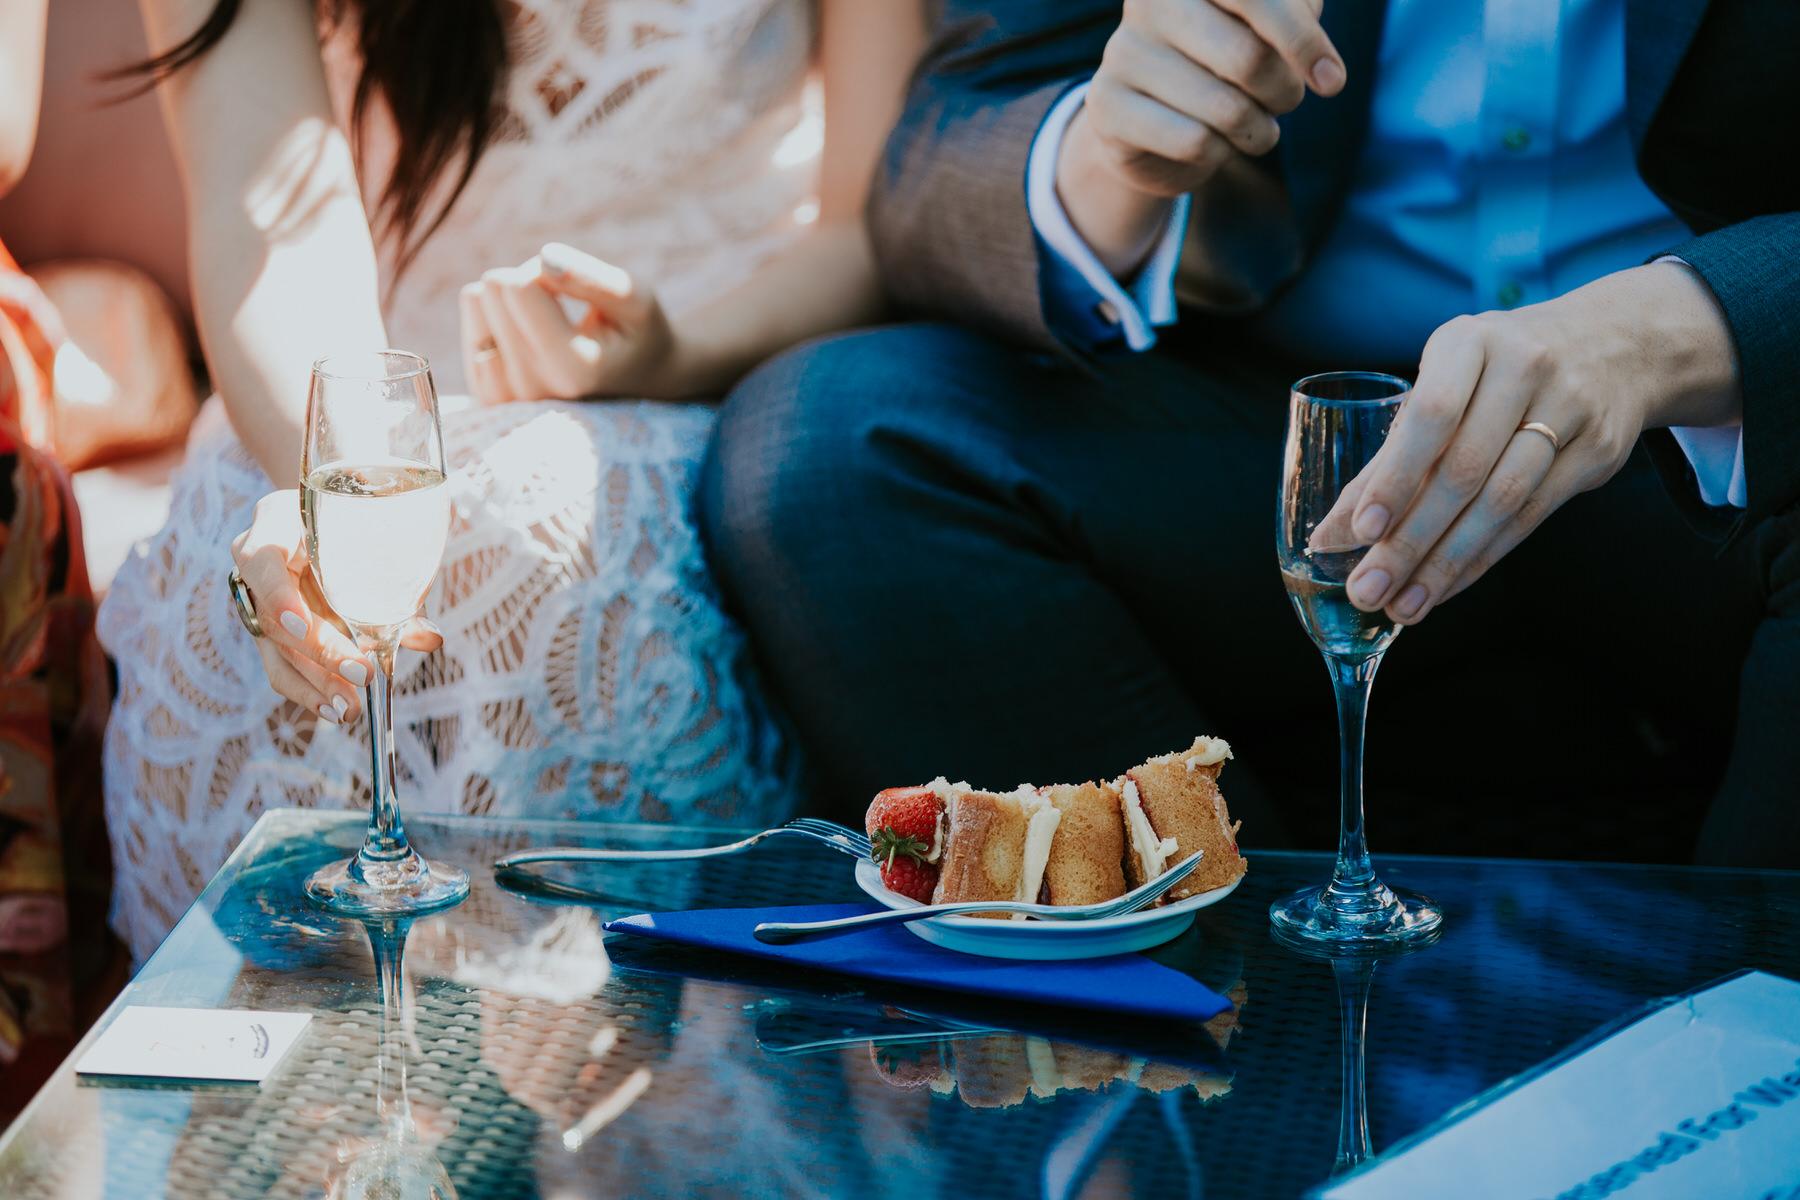 560 bride groom eating cake drinking champagne reportage wedding.jpg